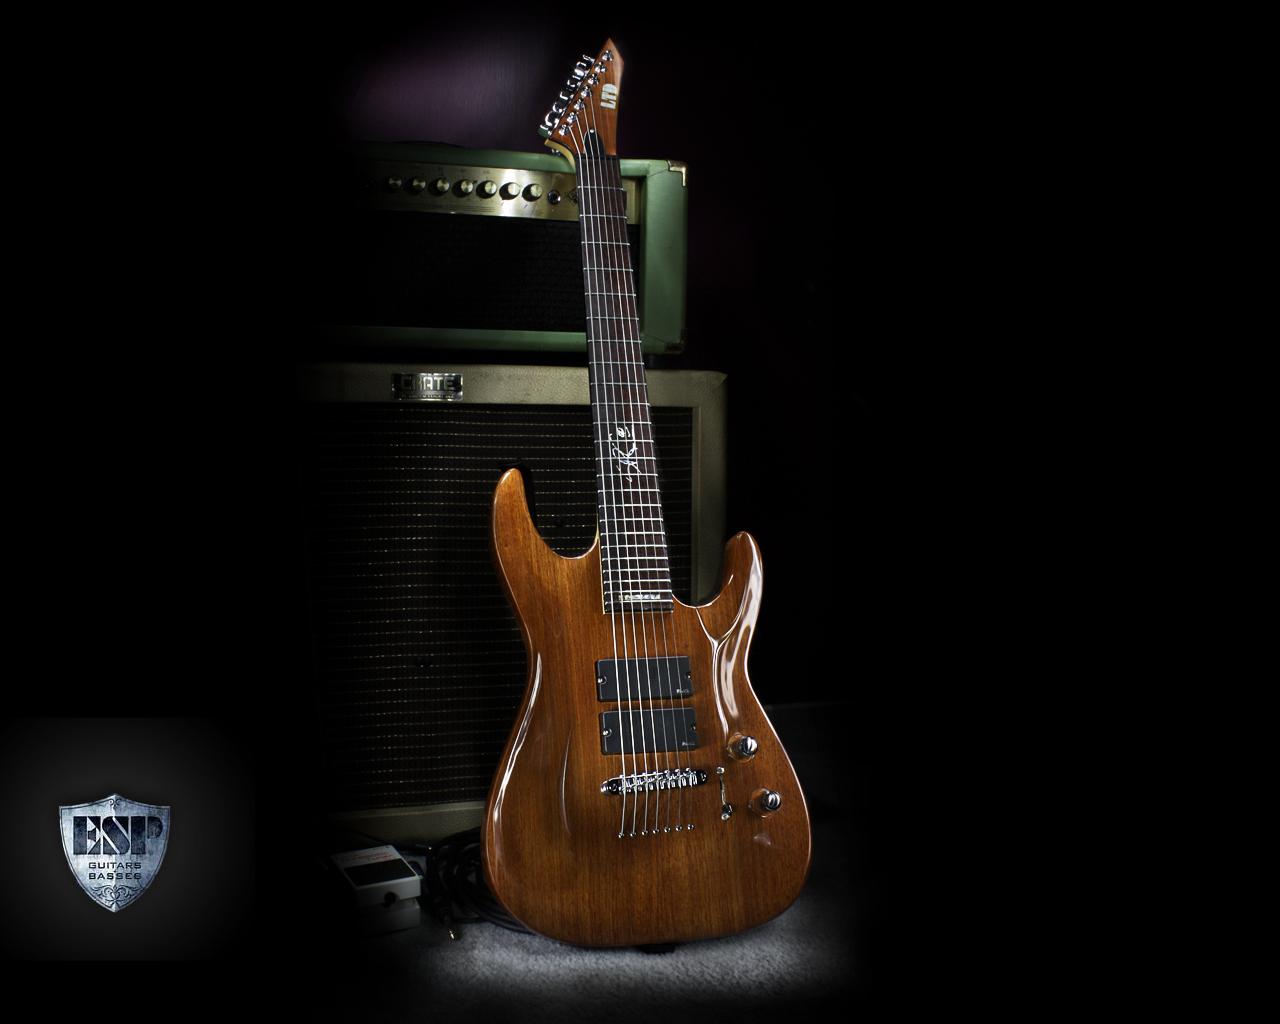 Ibanez N427 Electric Guitar Free Hd Pictures Wallpaper Download Elegant Esp  Ltd V 50 Electric Guitar